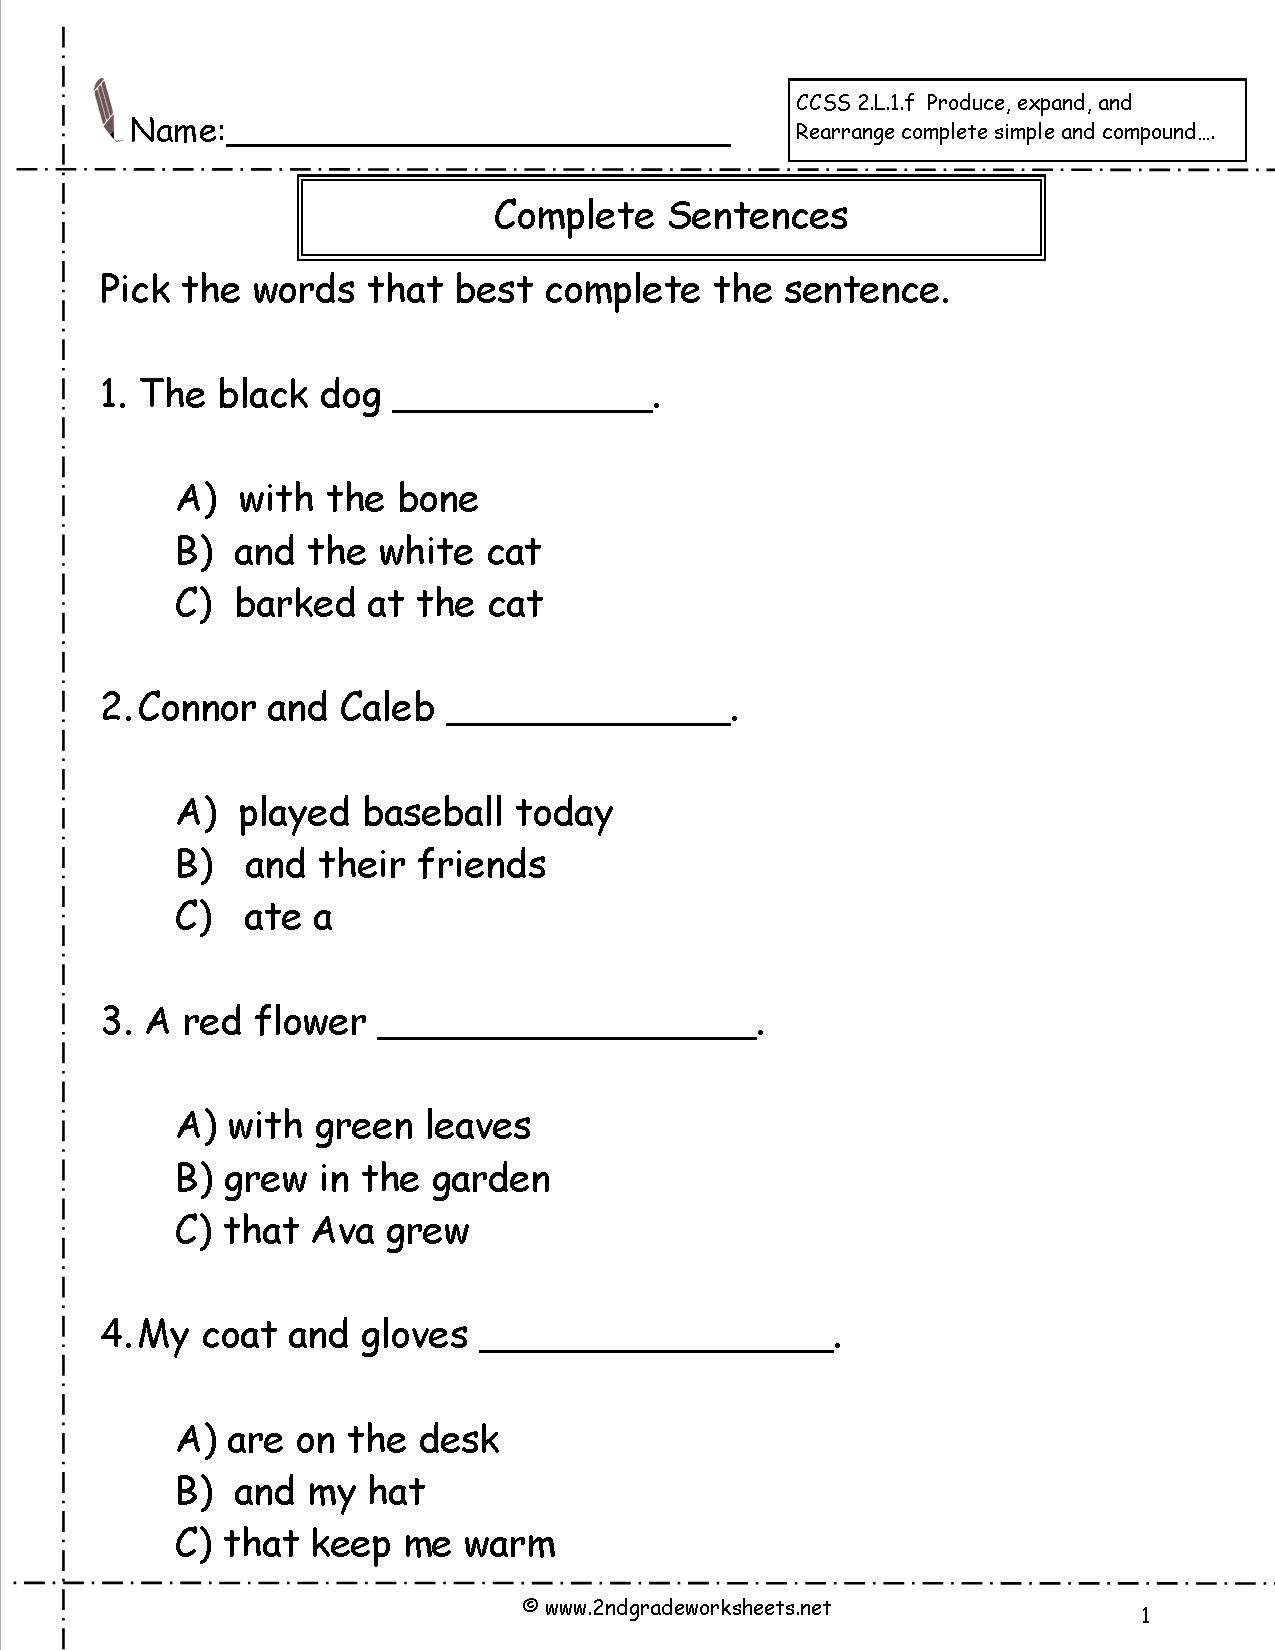 Complete Sentences Worksheet Education Pinterest Complete